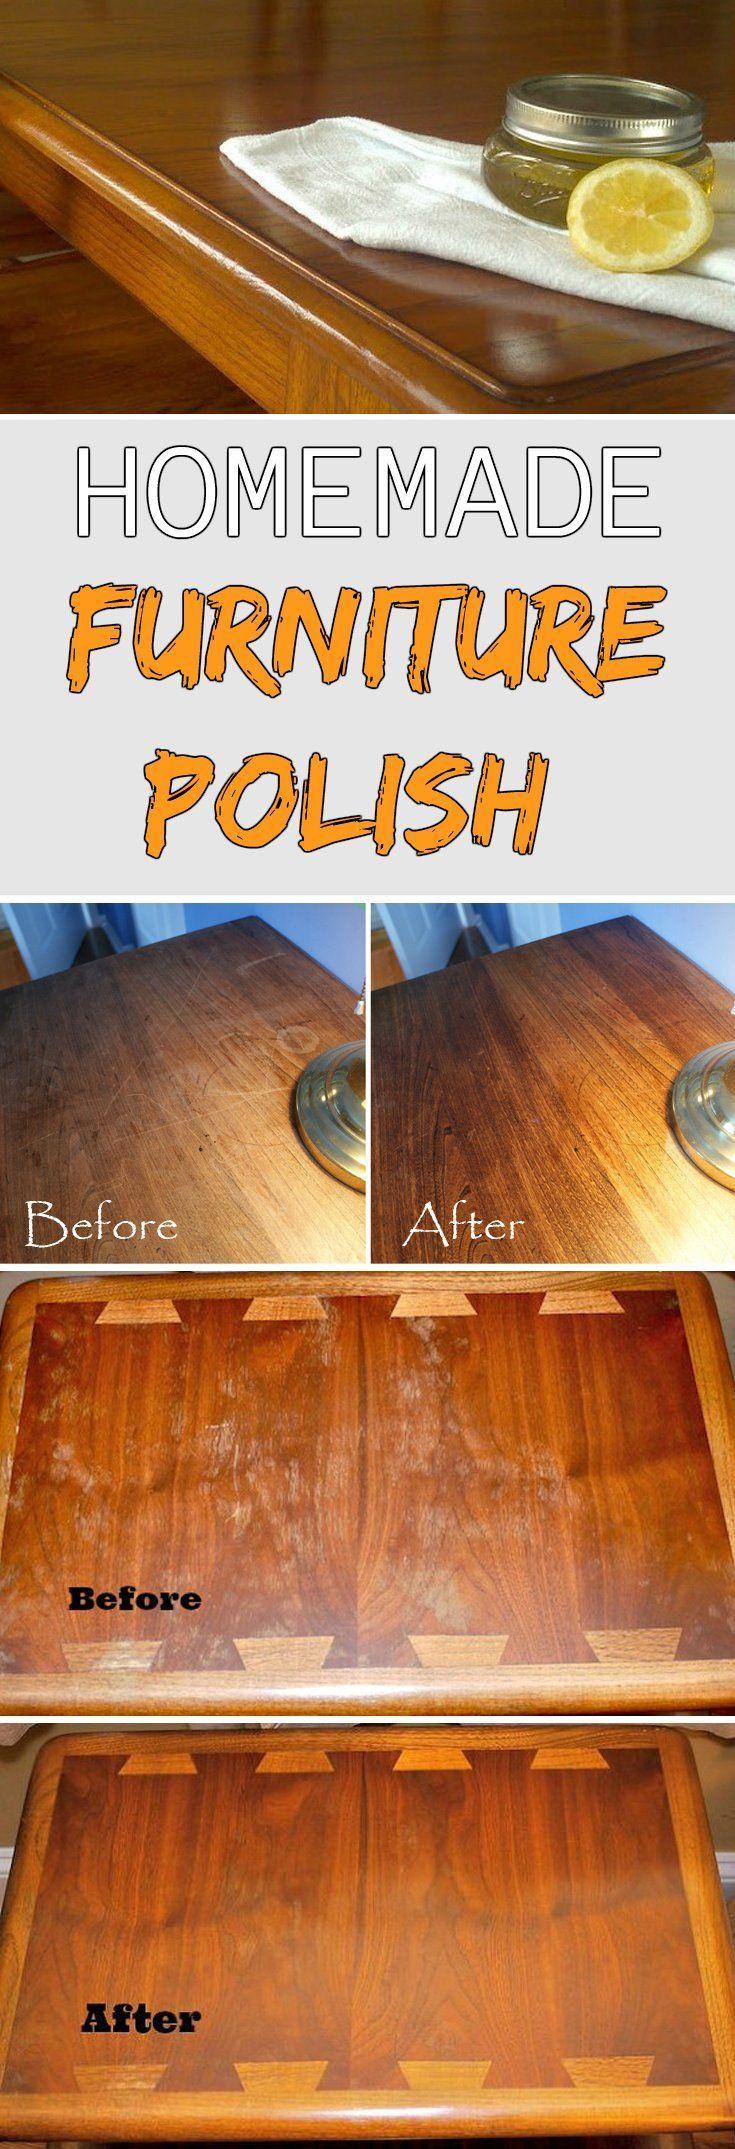 Homemade Furniture Polish. 3/4 cup olive oil, 1/4 cup distilled white vinegar, 1 teaspoon lemon juice